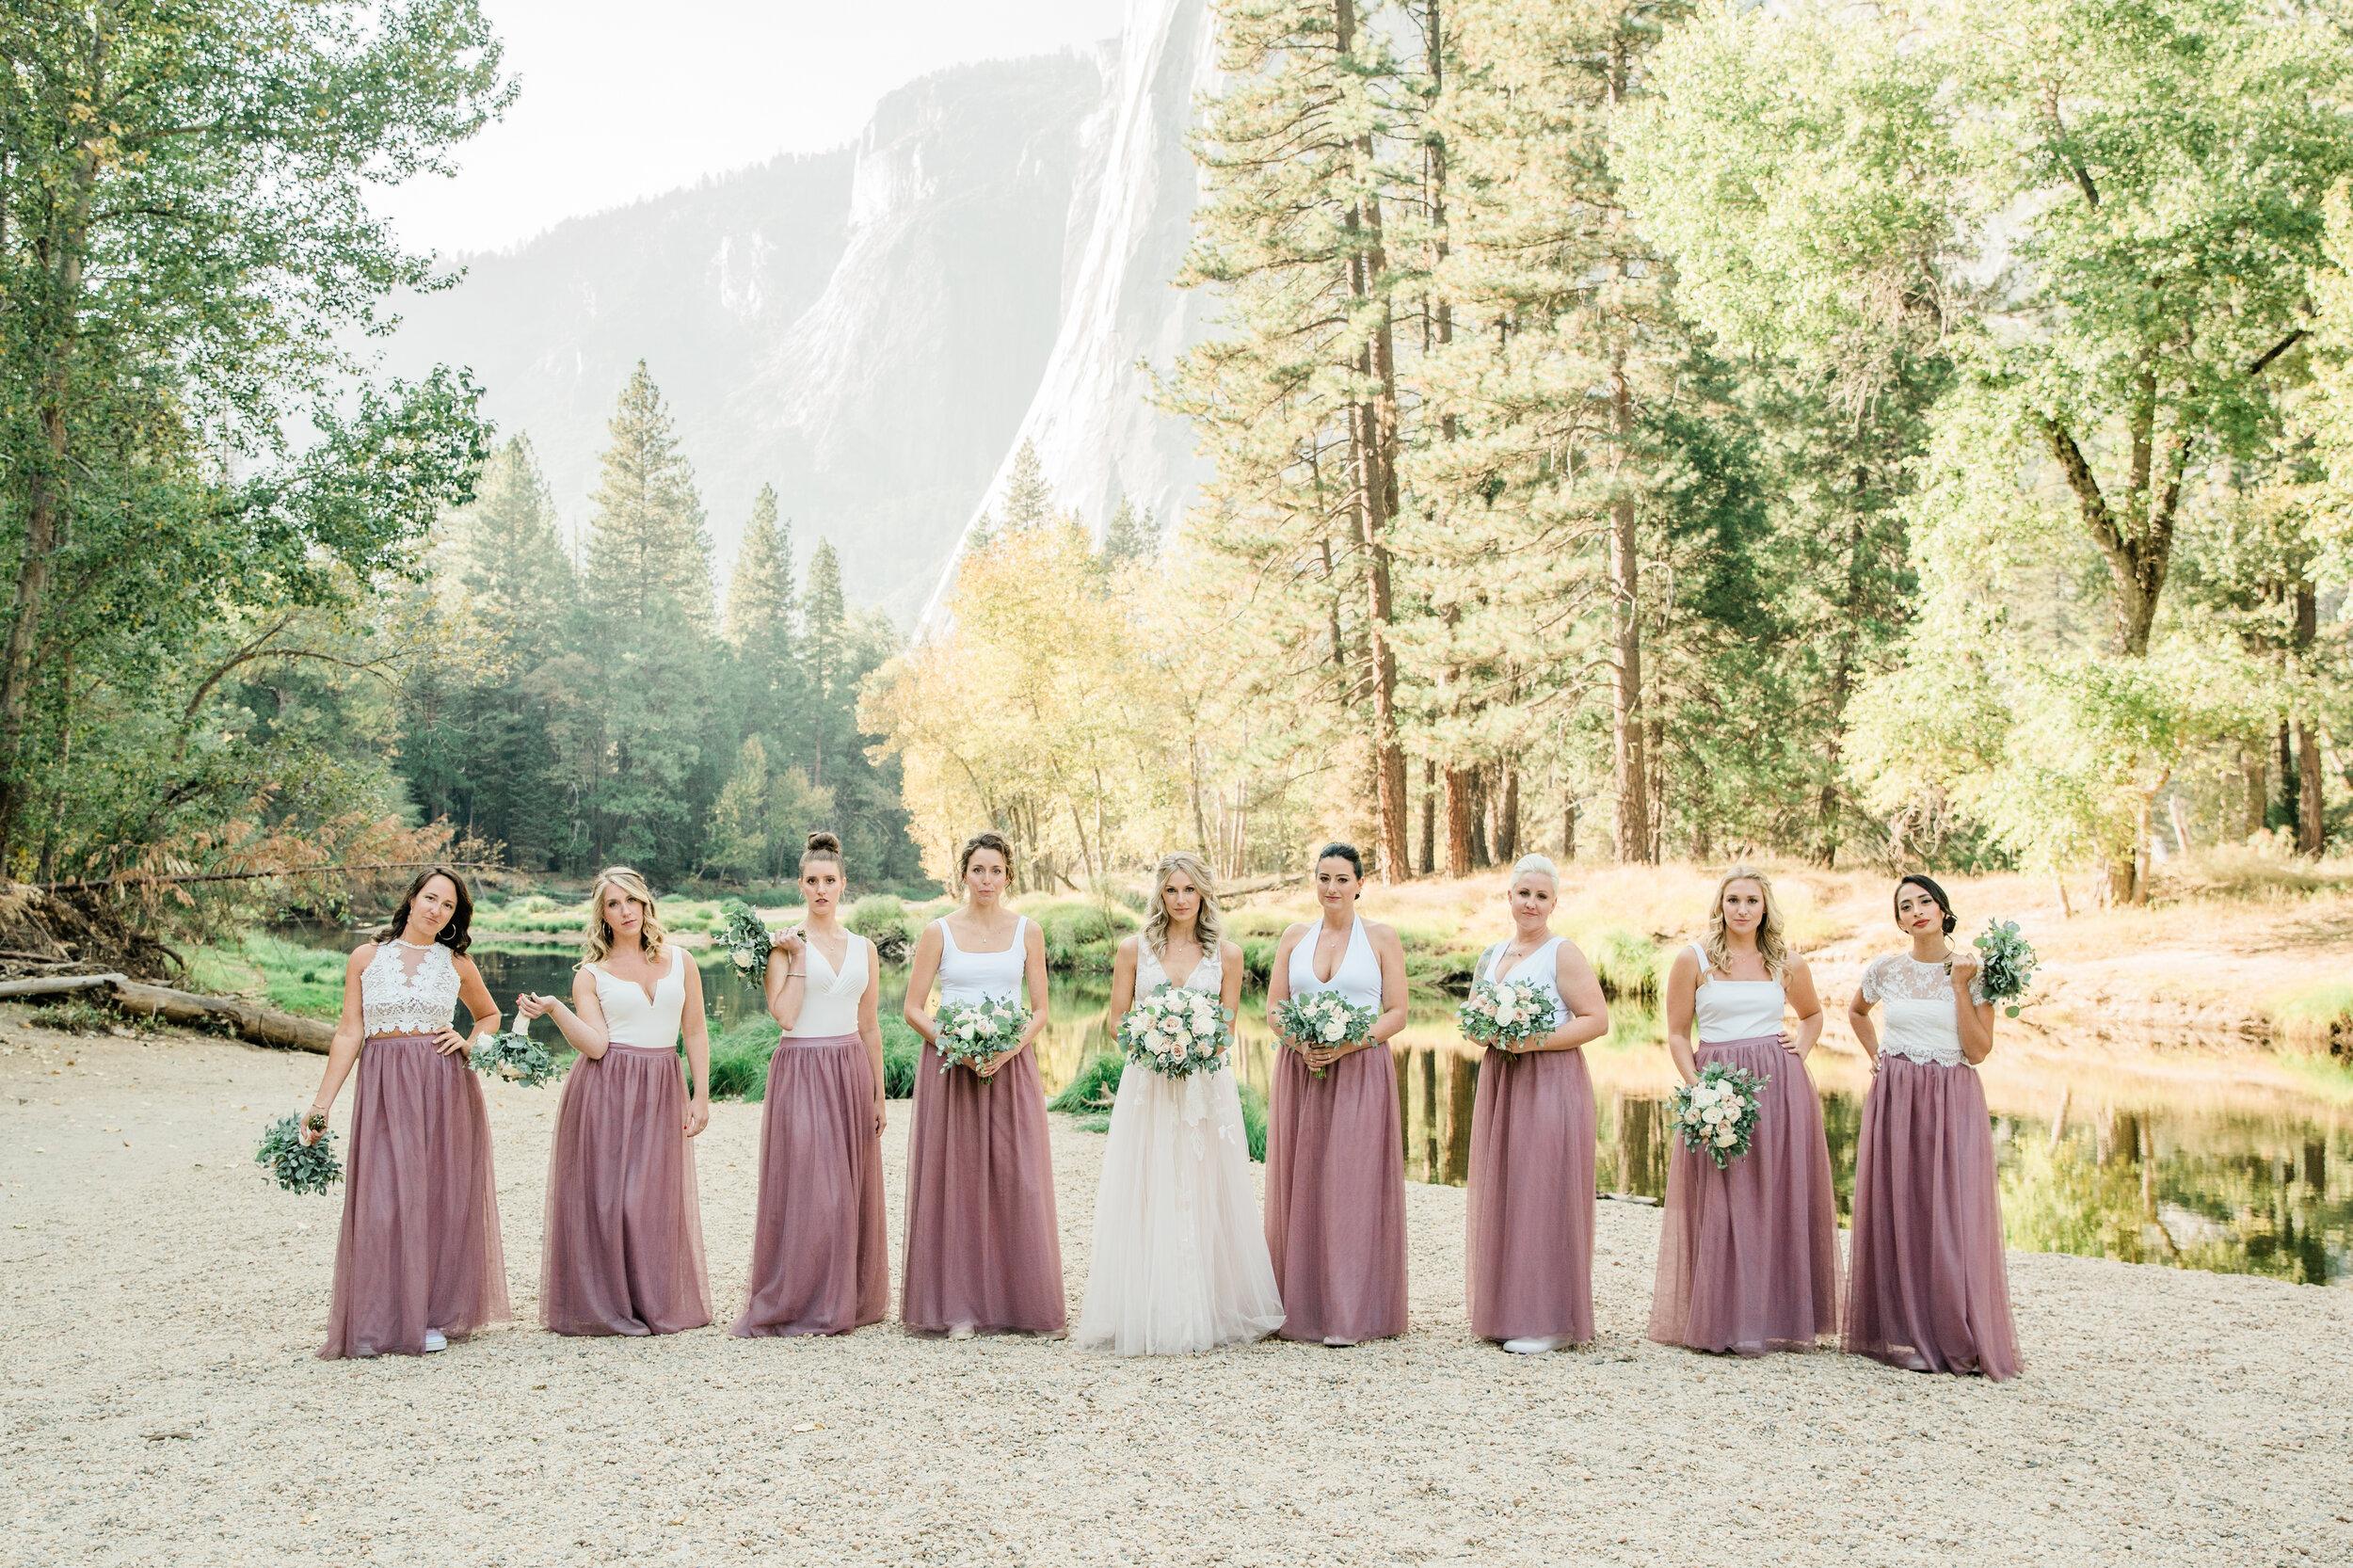 Leanne and Joe - Married - Sneak Peeks - Lauren Alisse Photography-23.jpg